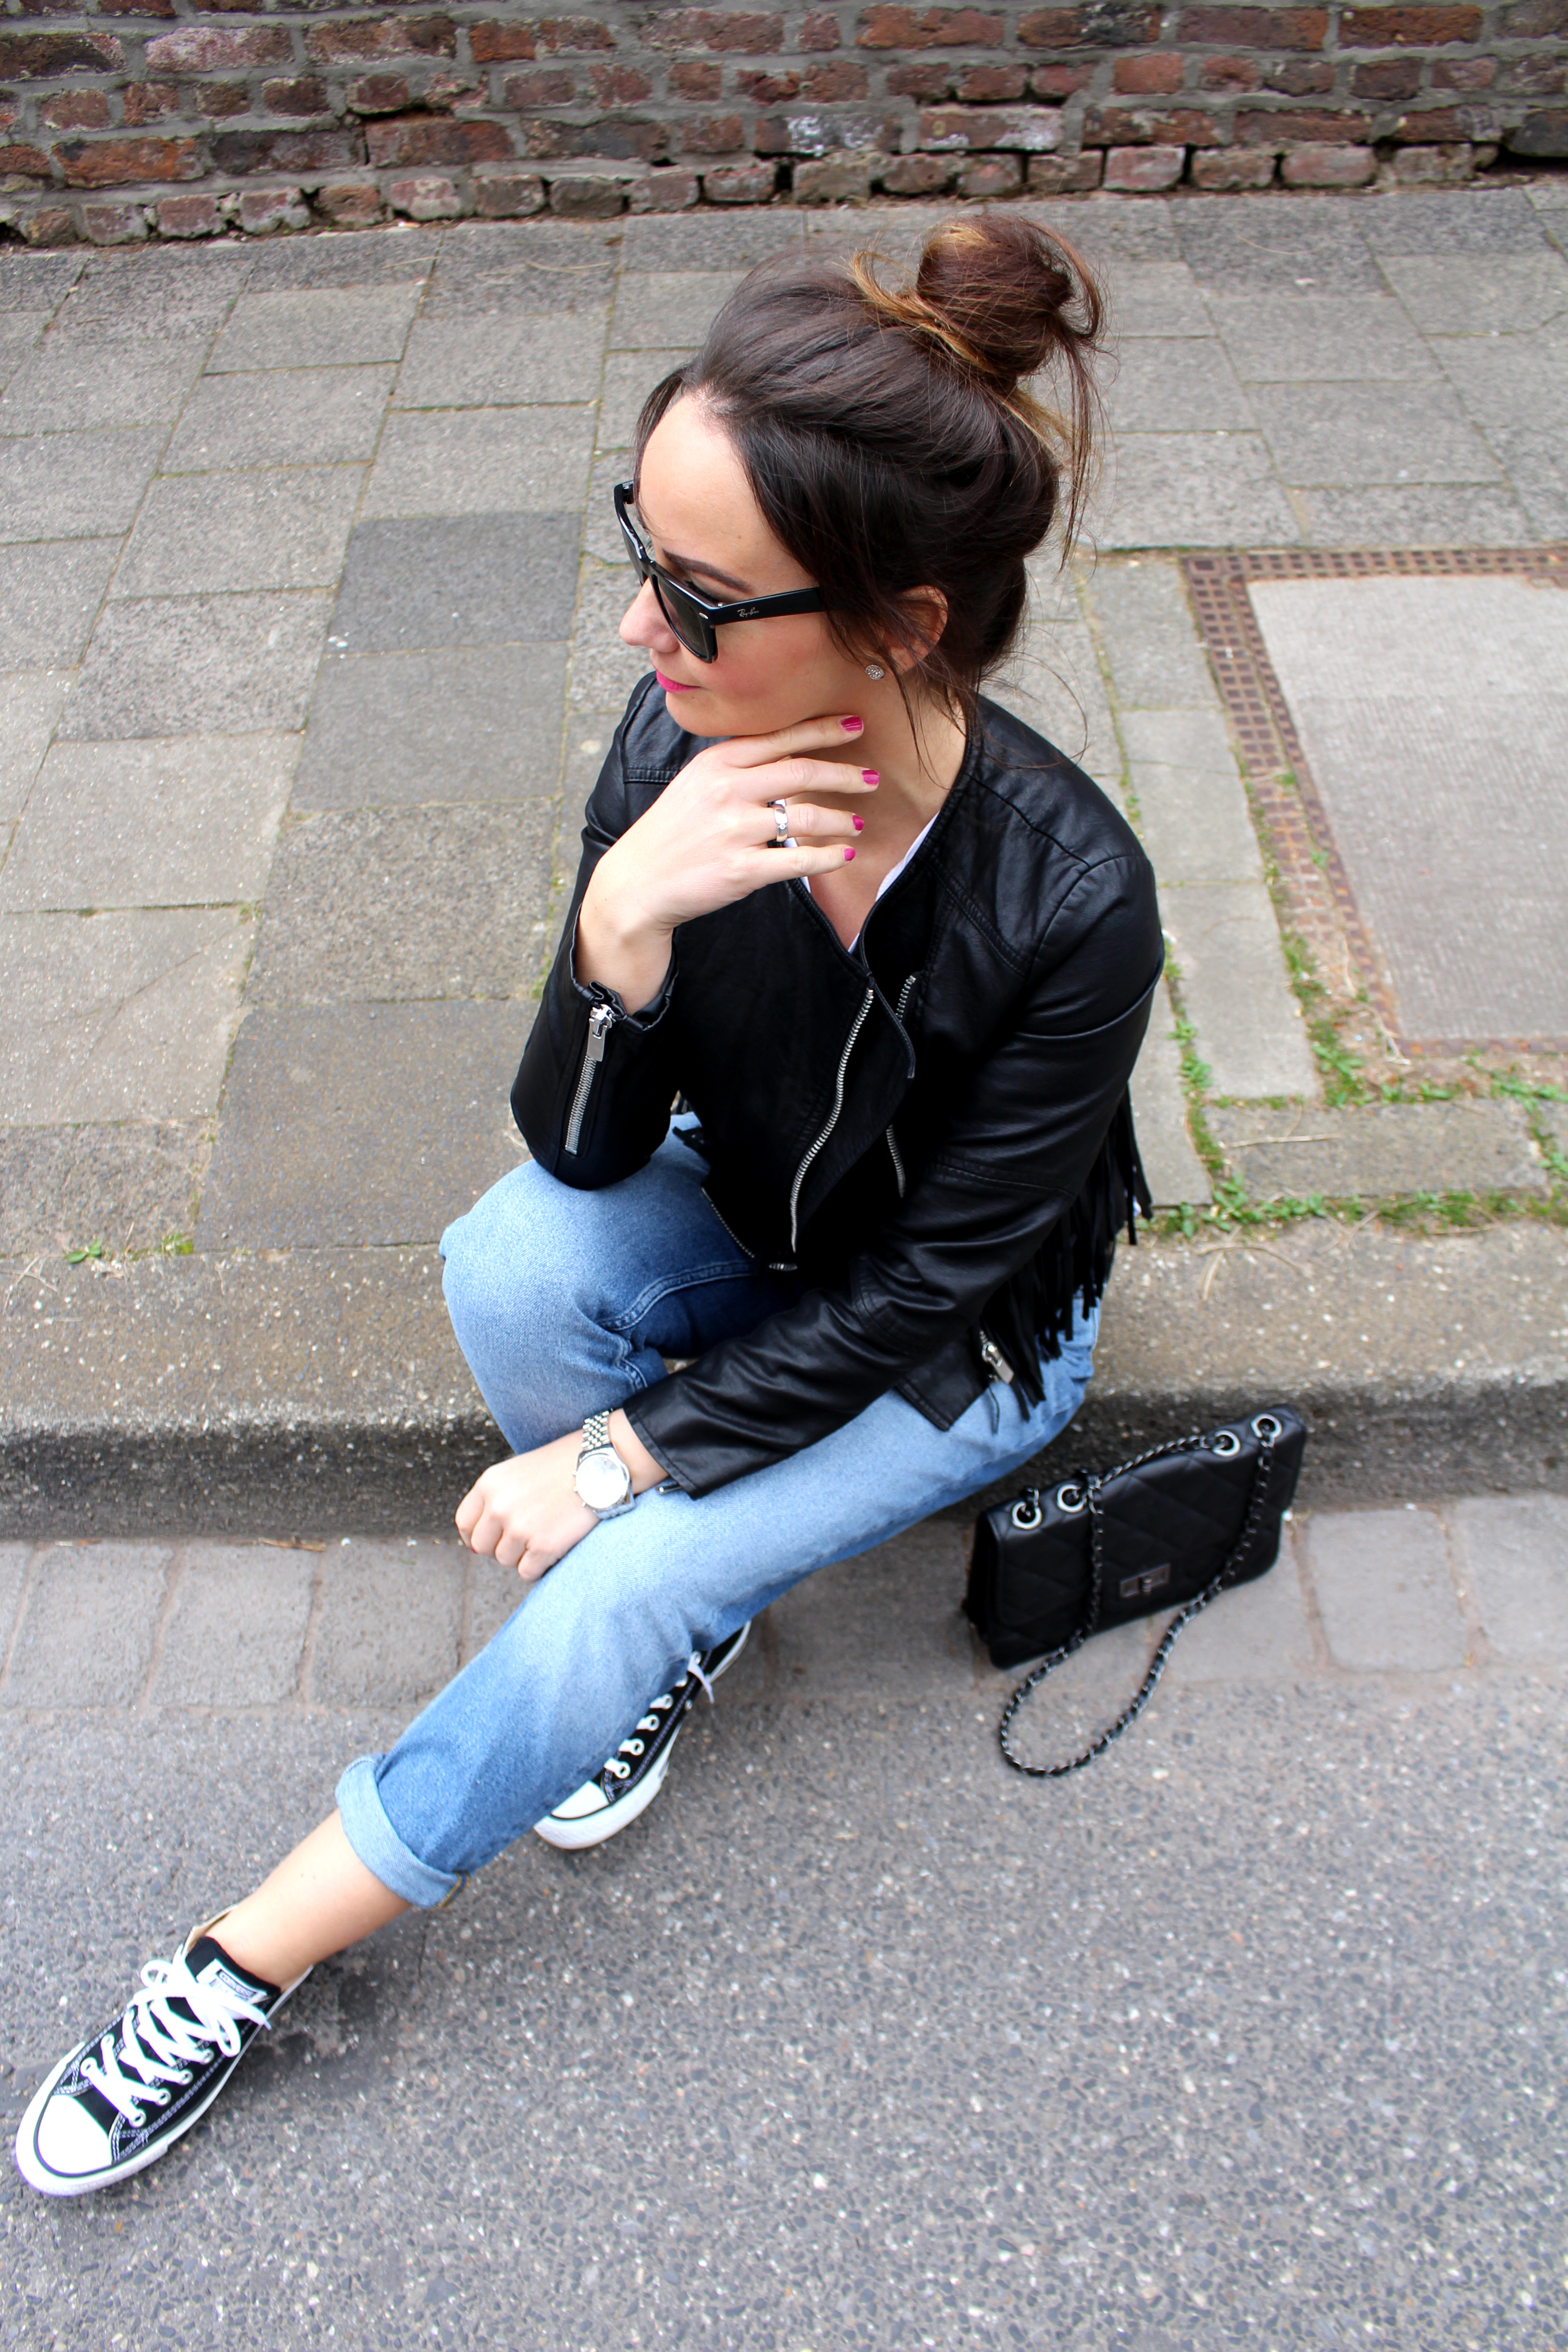 Fashioncircuz by Jenny img_4861 80s REVIVAL - I FEEL LIKE MADONNA